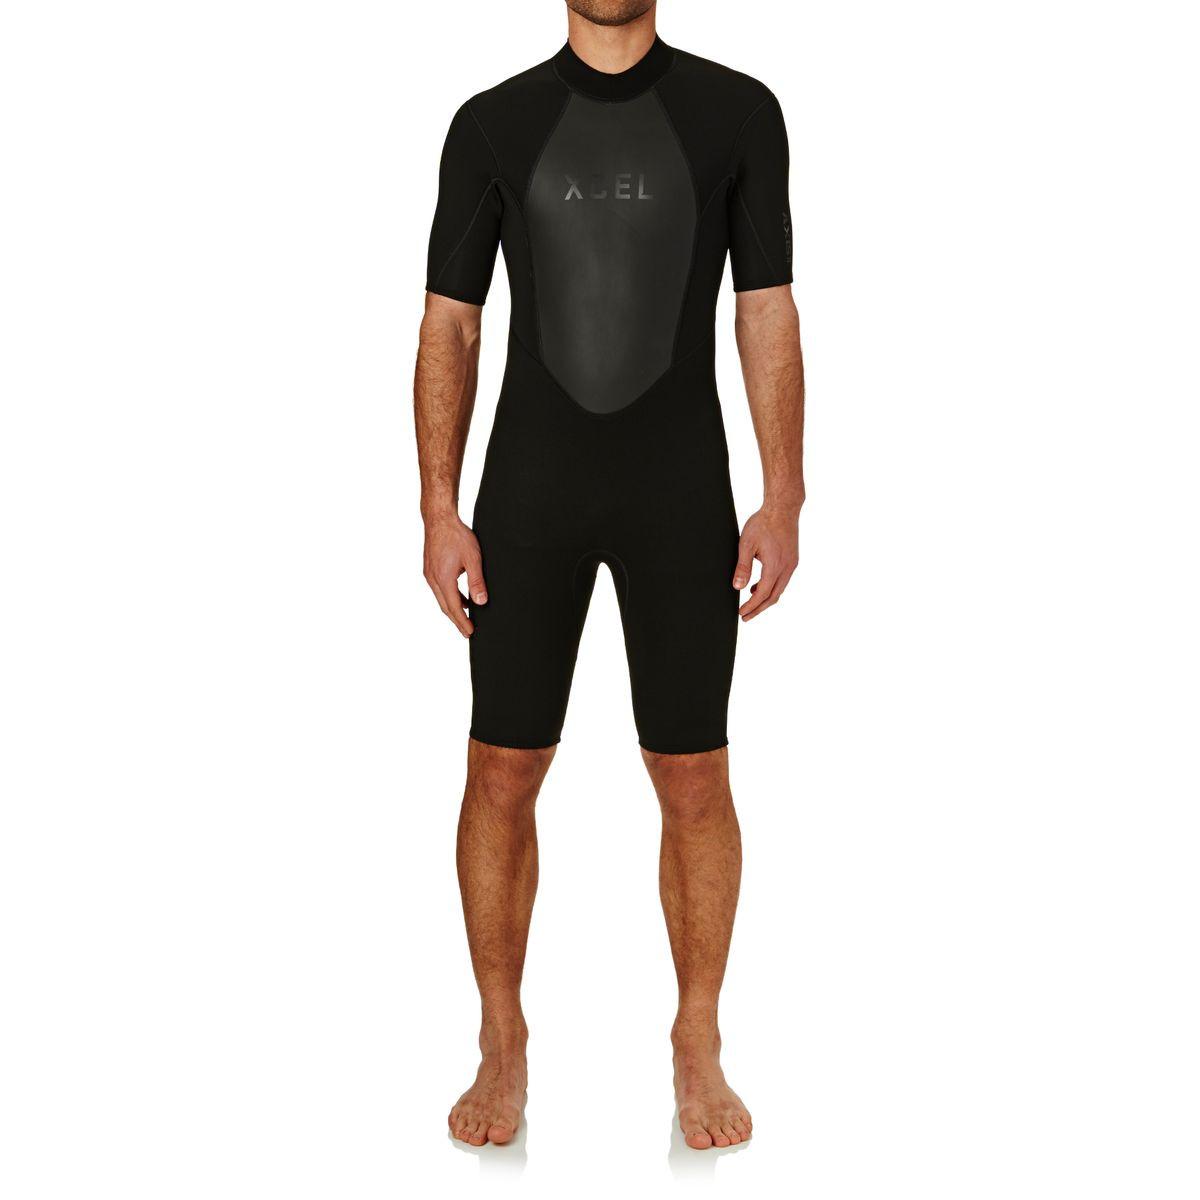 Xcel Axis OS 2mm 2017 Back Zip Short Sleeve Wetsuit - Black